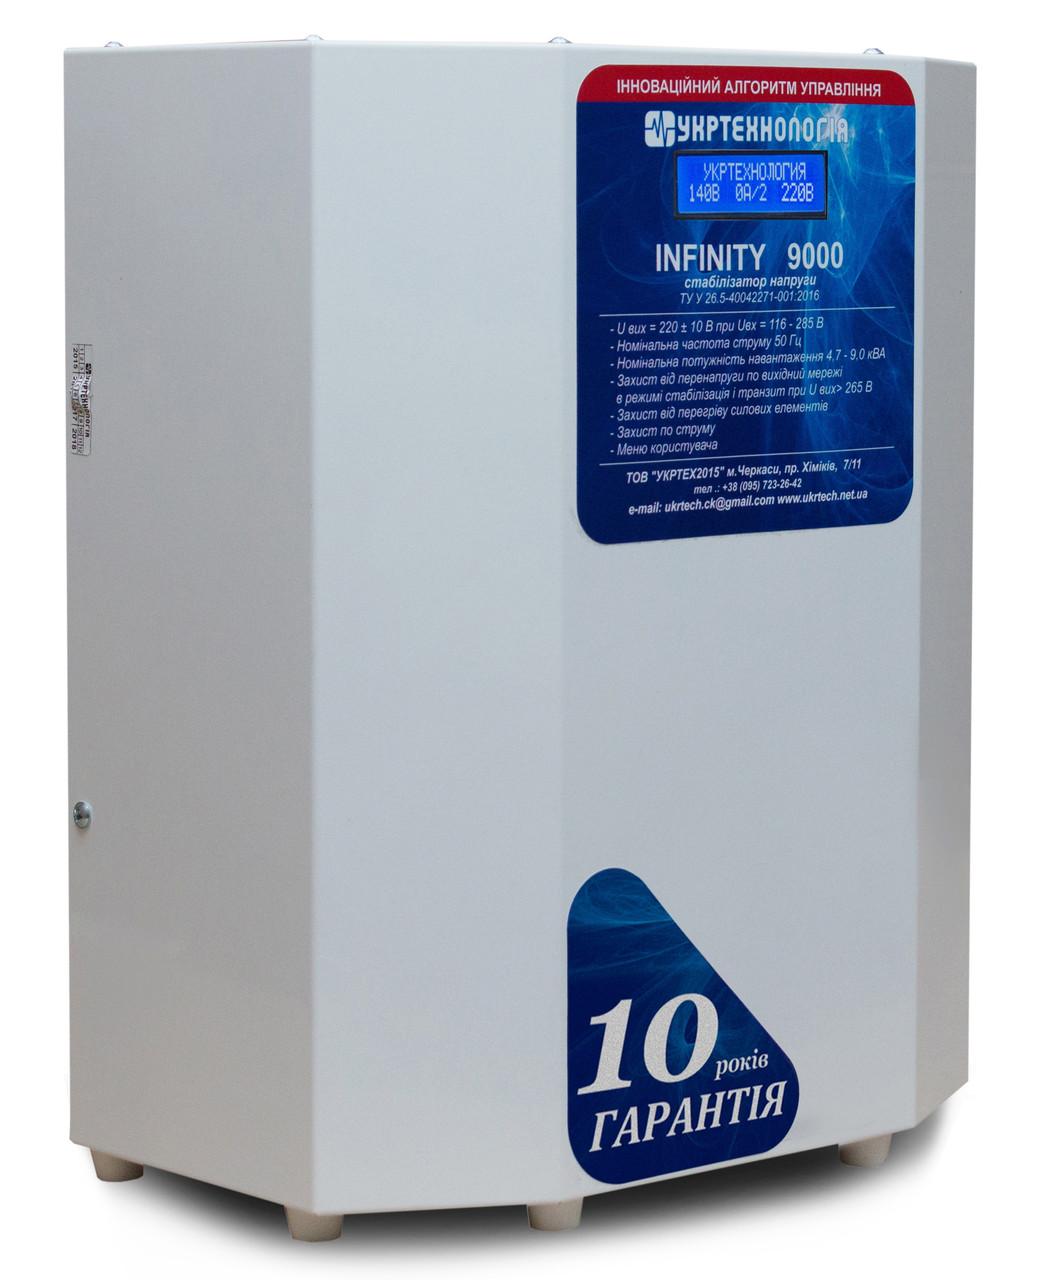 Укртехнология НСН-9000 Infinity